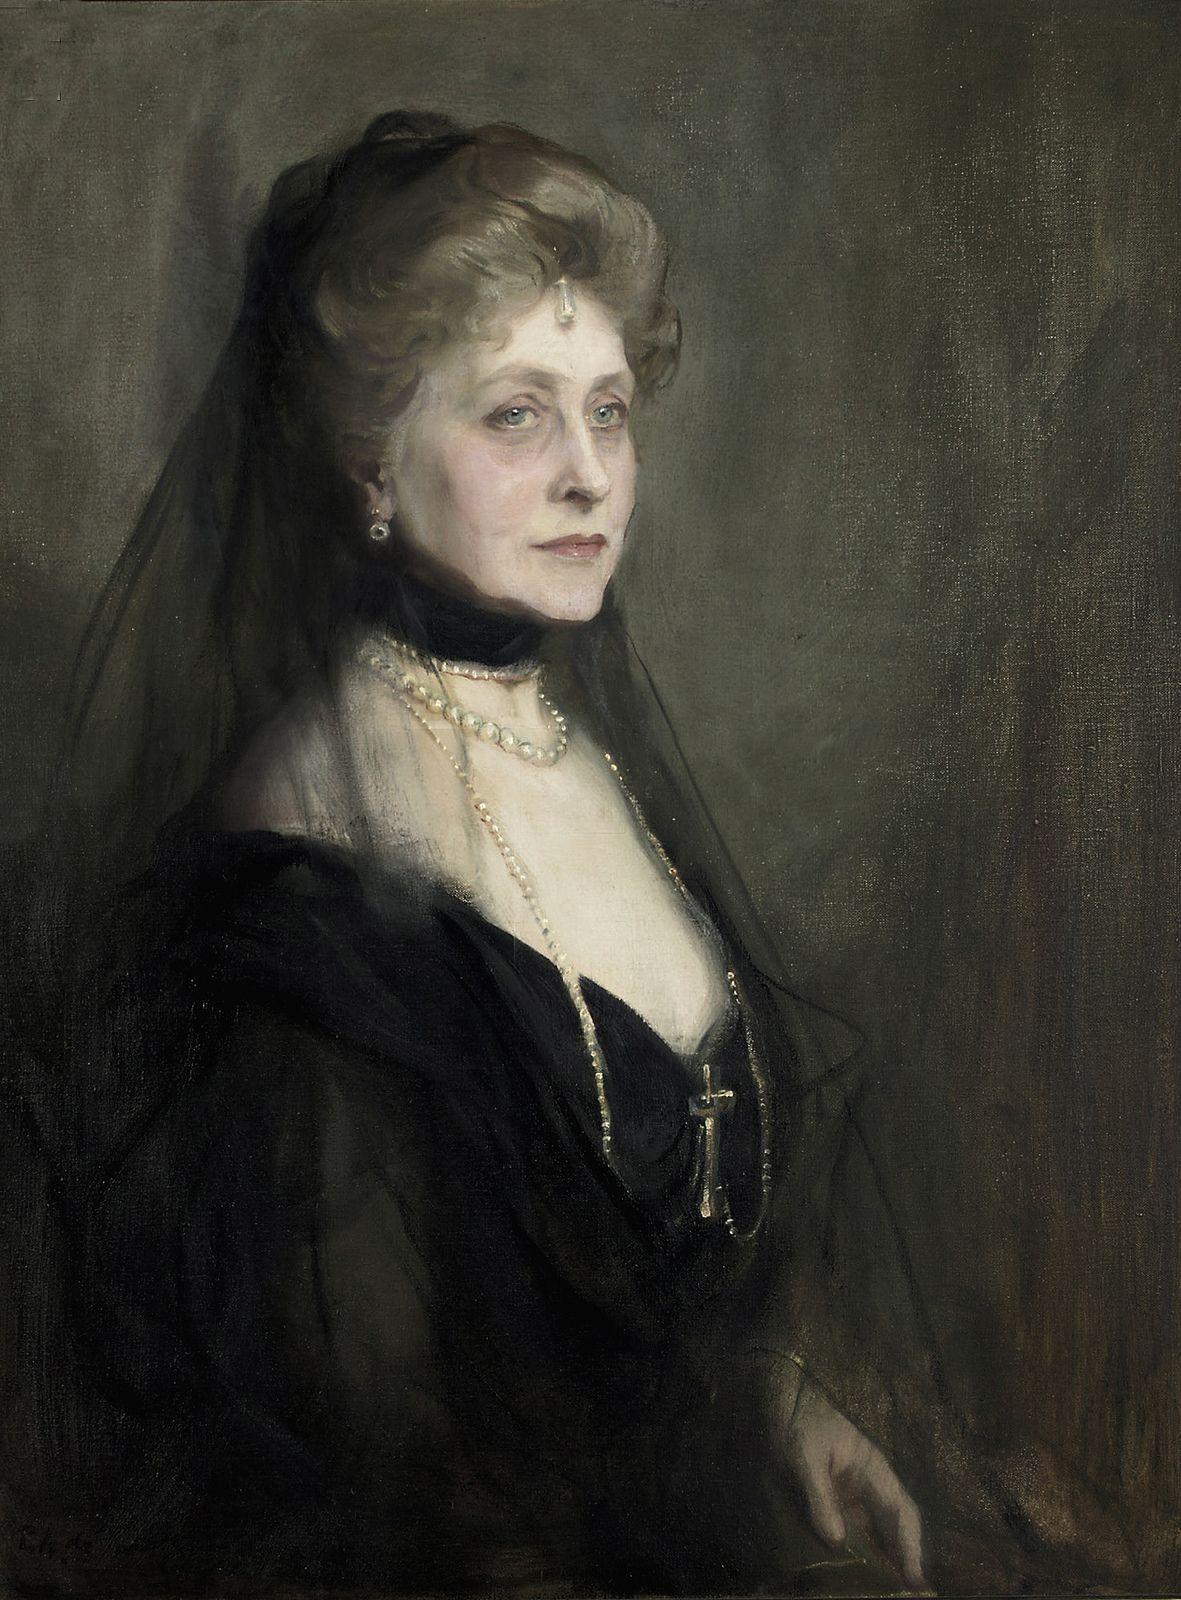 Hrh Princess Of Britain Louise Of Saxe Coburg Gotha Marchioness Of Lorne Duchess Of Argyll By De Lazslo Queen Victoria Children Princess Louise Queen Victoria